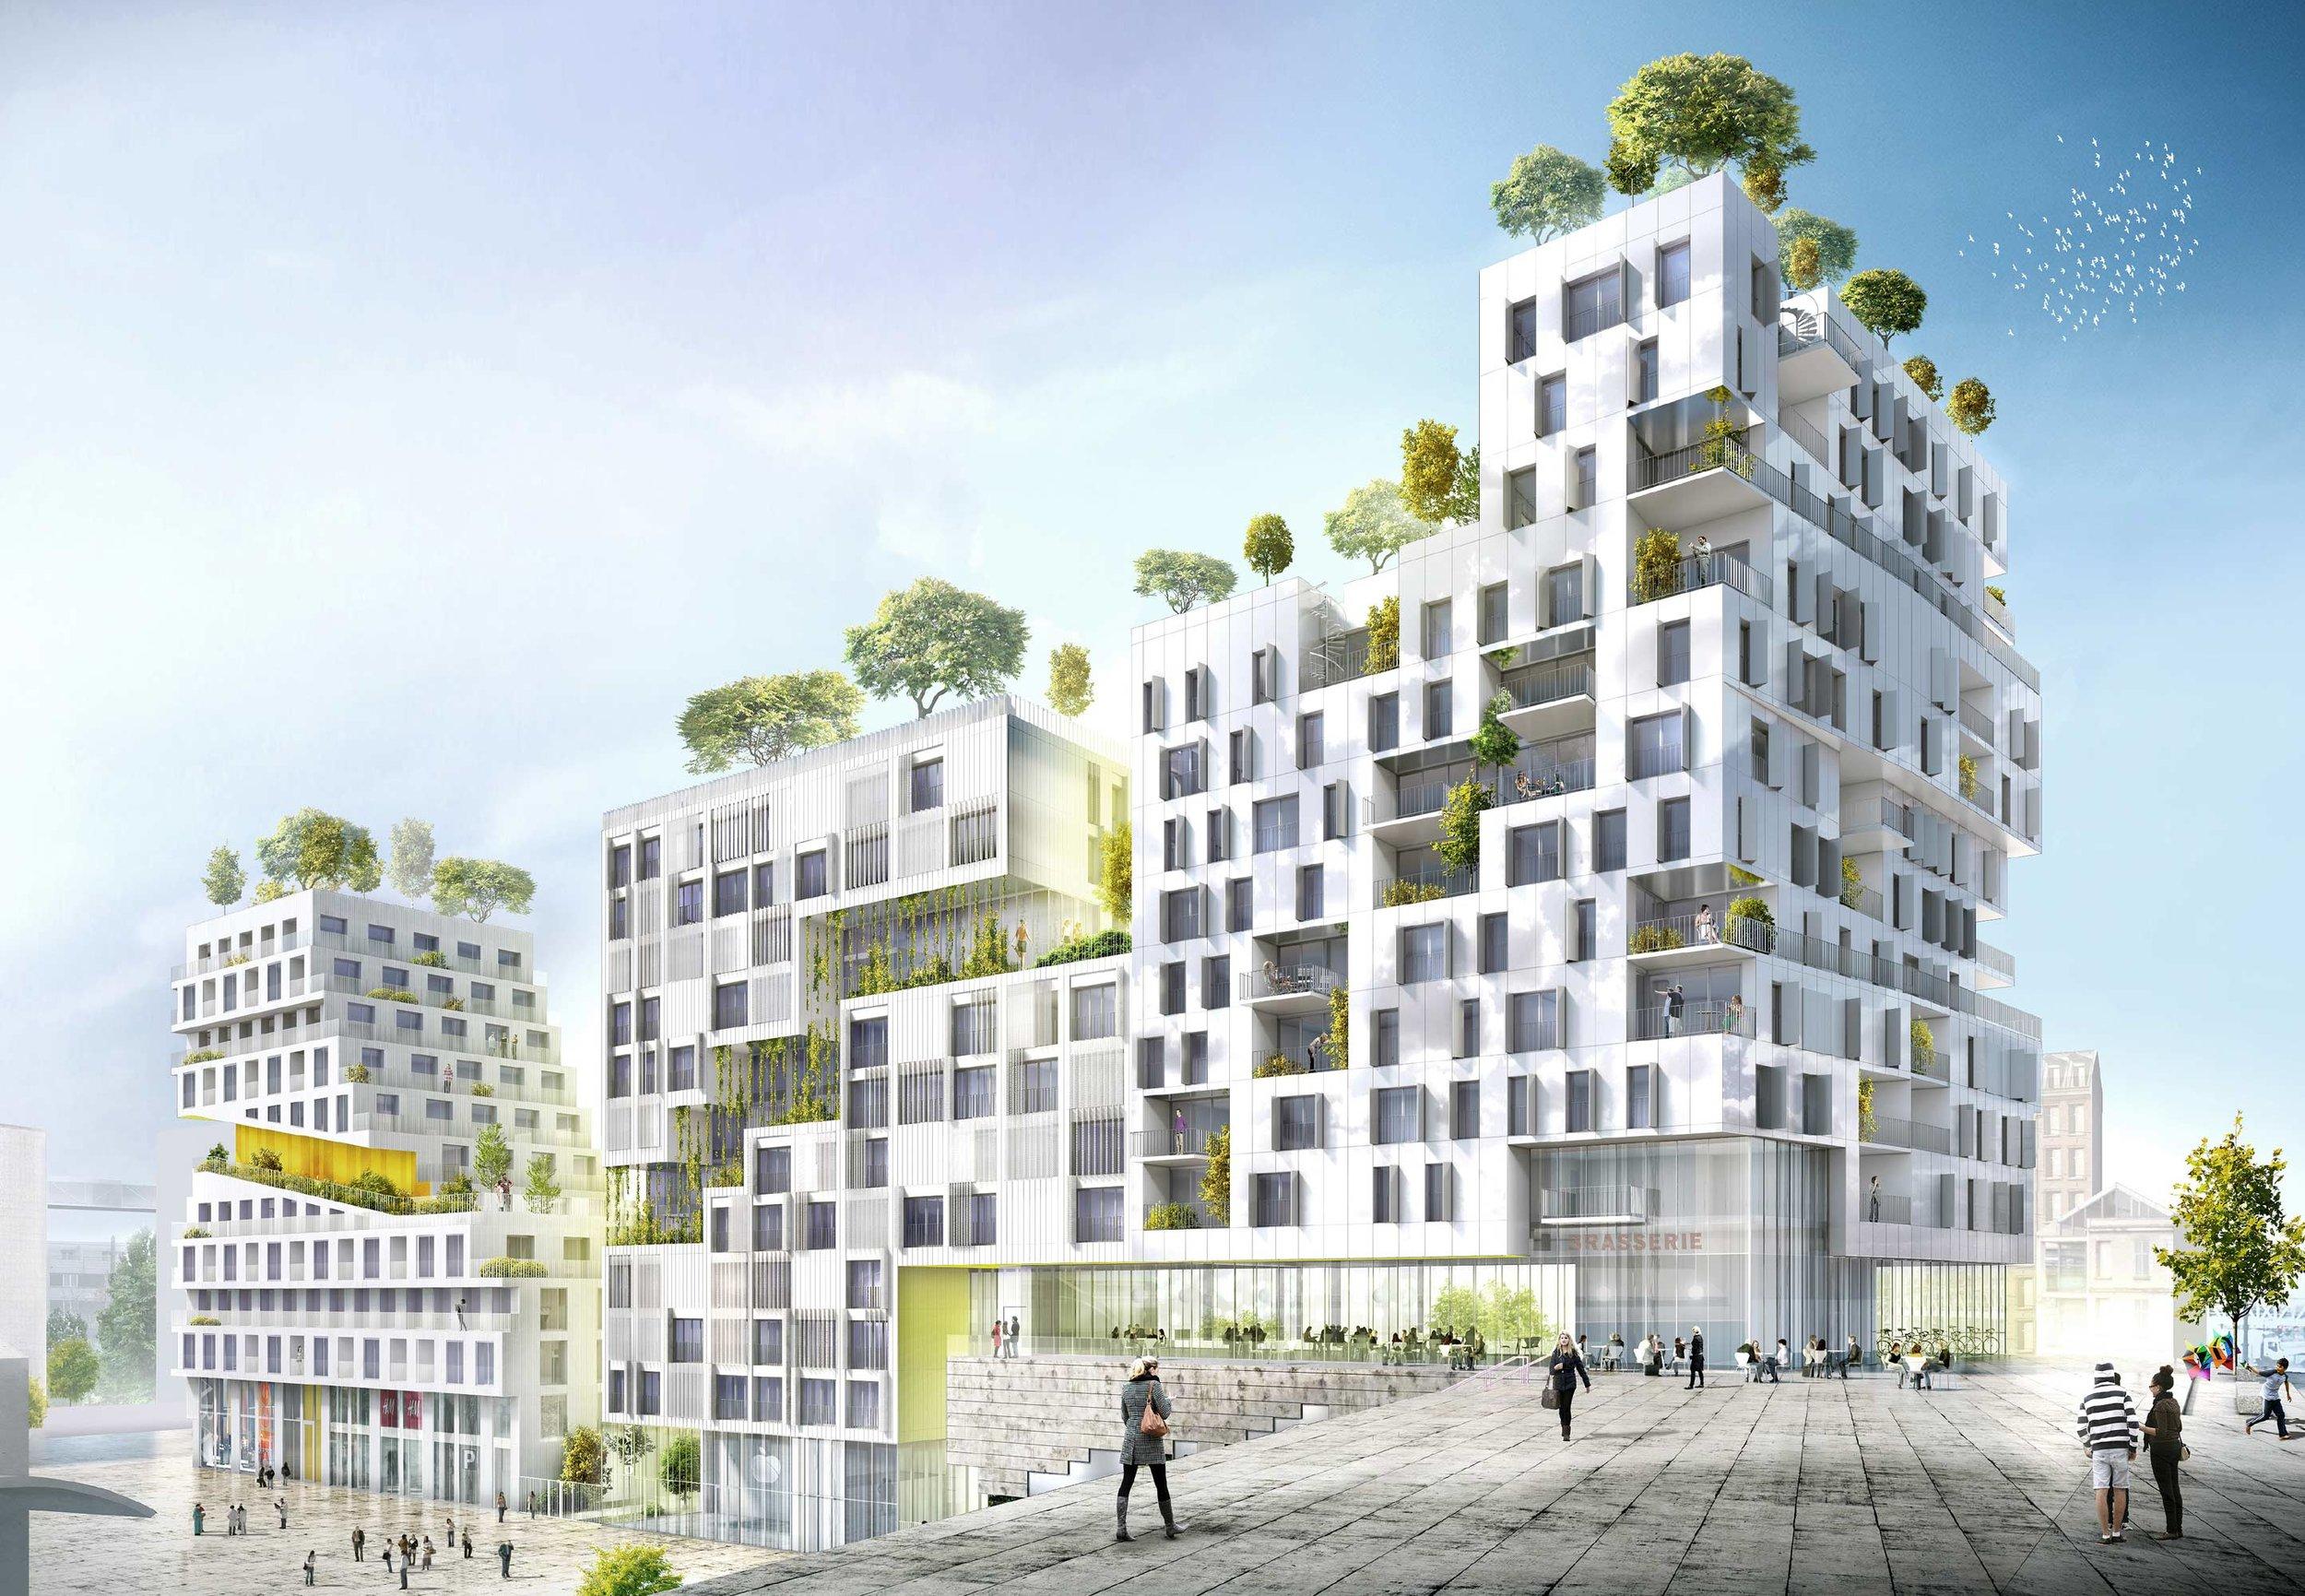 Residence-Paris-Perspective-03.jpg